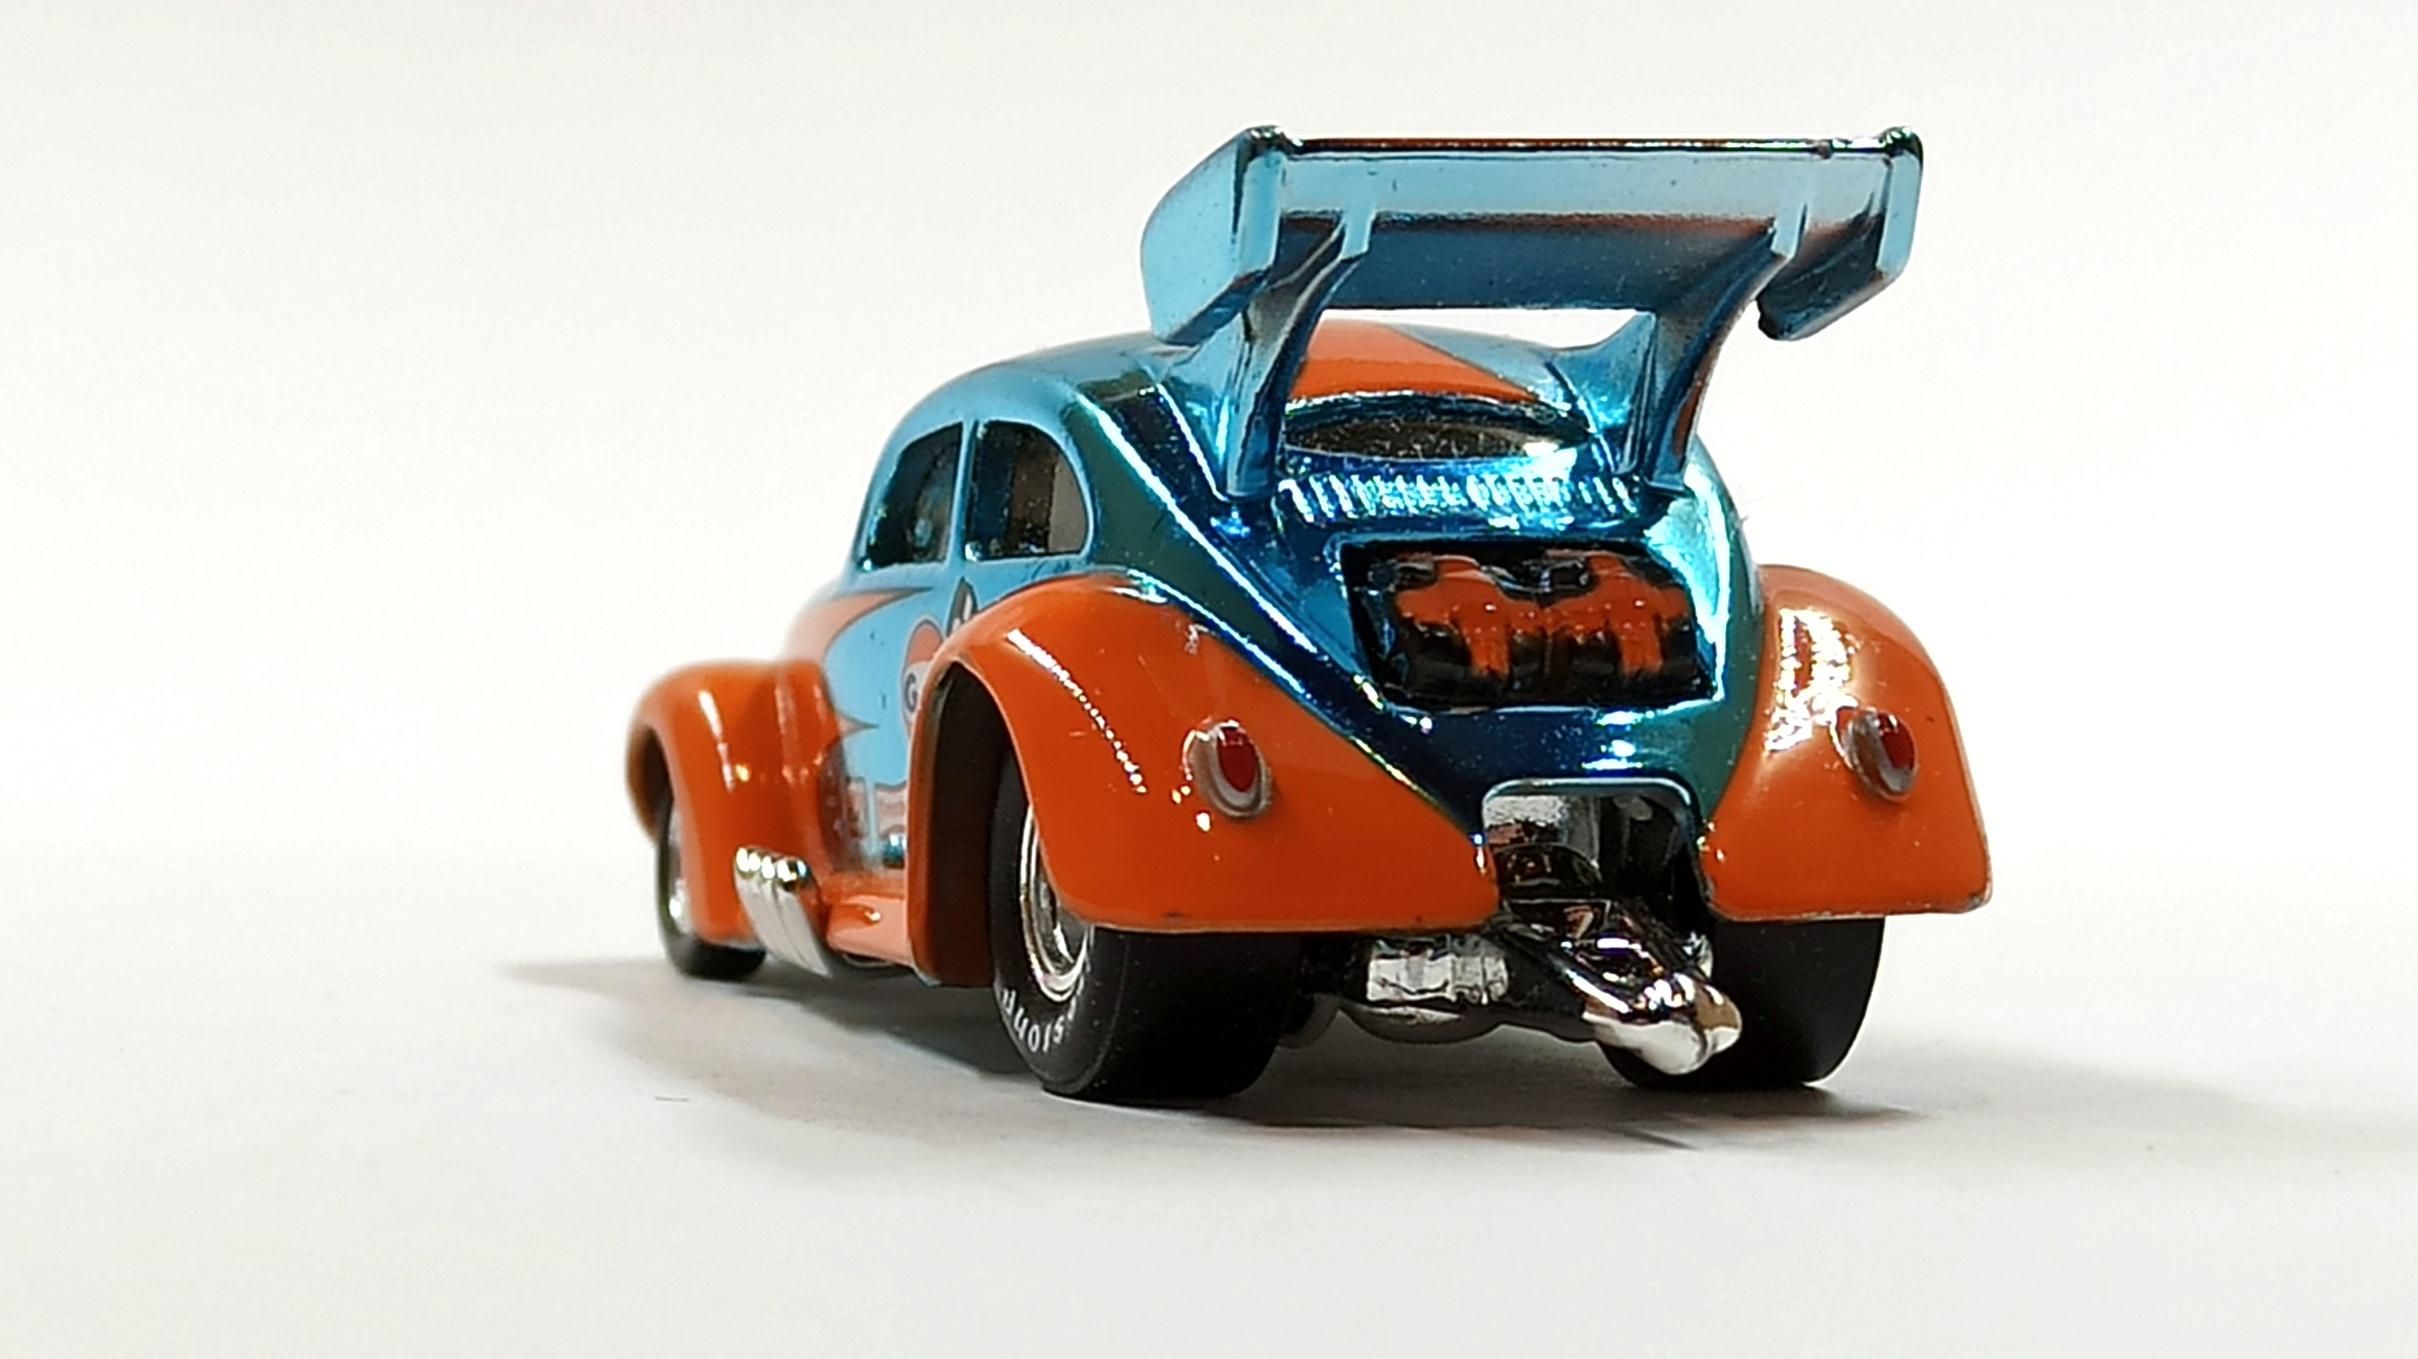 Hot Wheels Custom '56 Volkswagen Drag Beetle (Y0452) 2013 HWC Gulf Racing (3/4) (1 of 4.000) spectraflame light blue (Gulf) back view